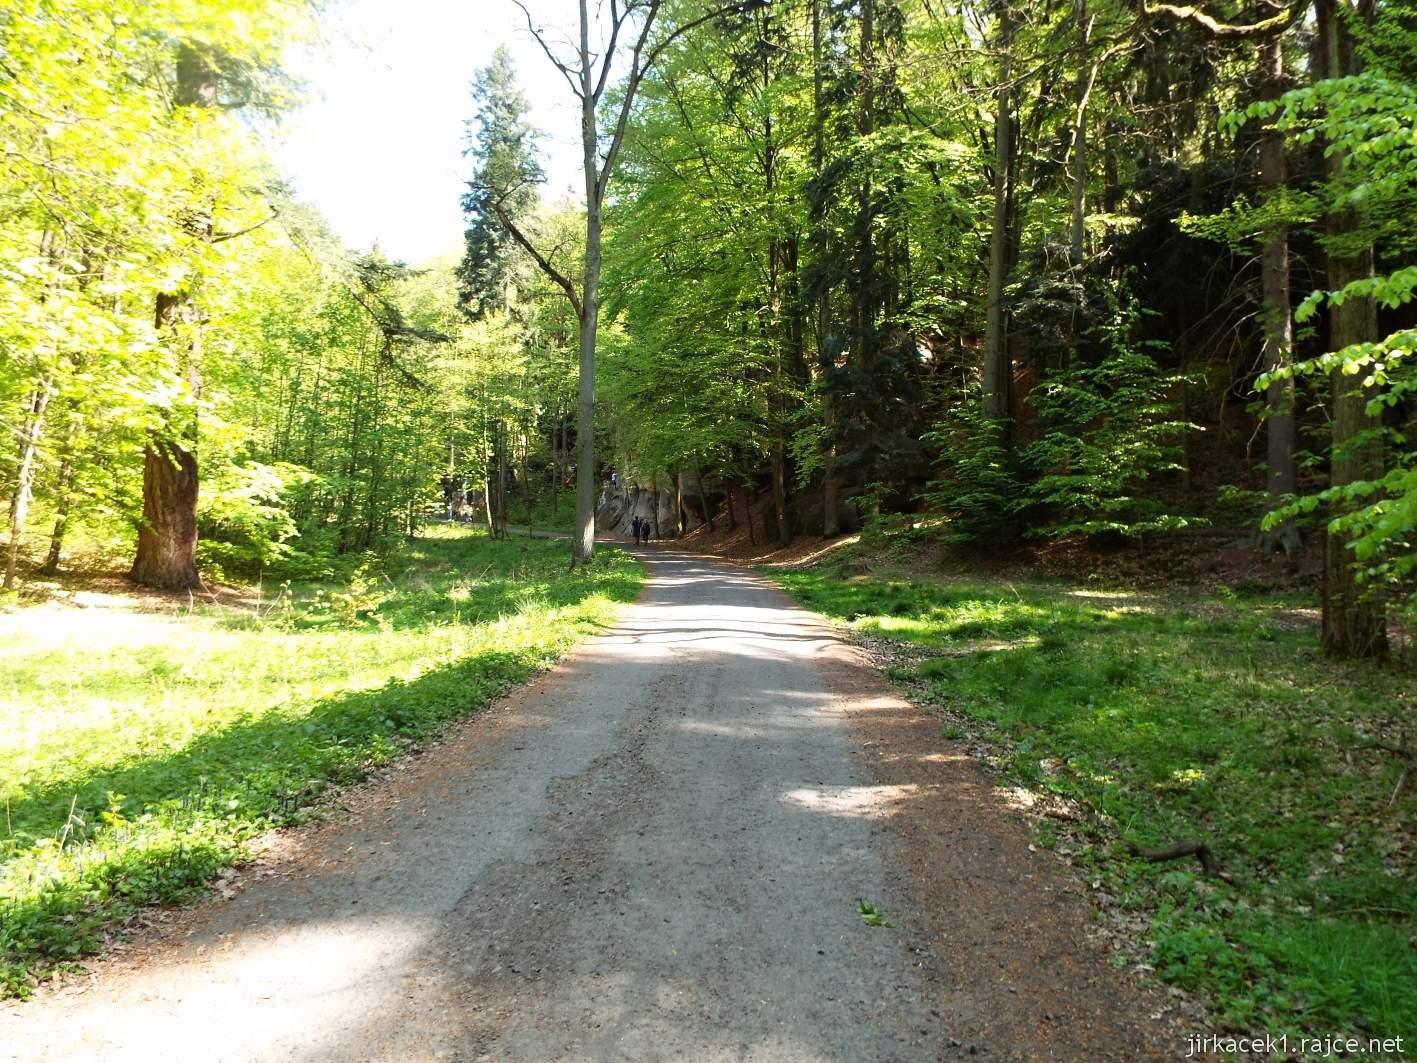 Hruboskalsko - cesta z arboreta Bukovina k Adamově loži